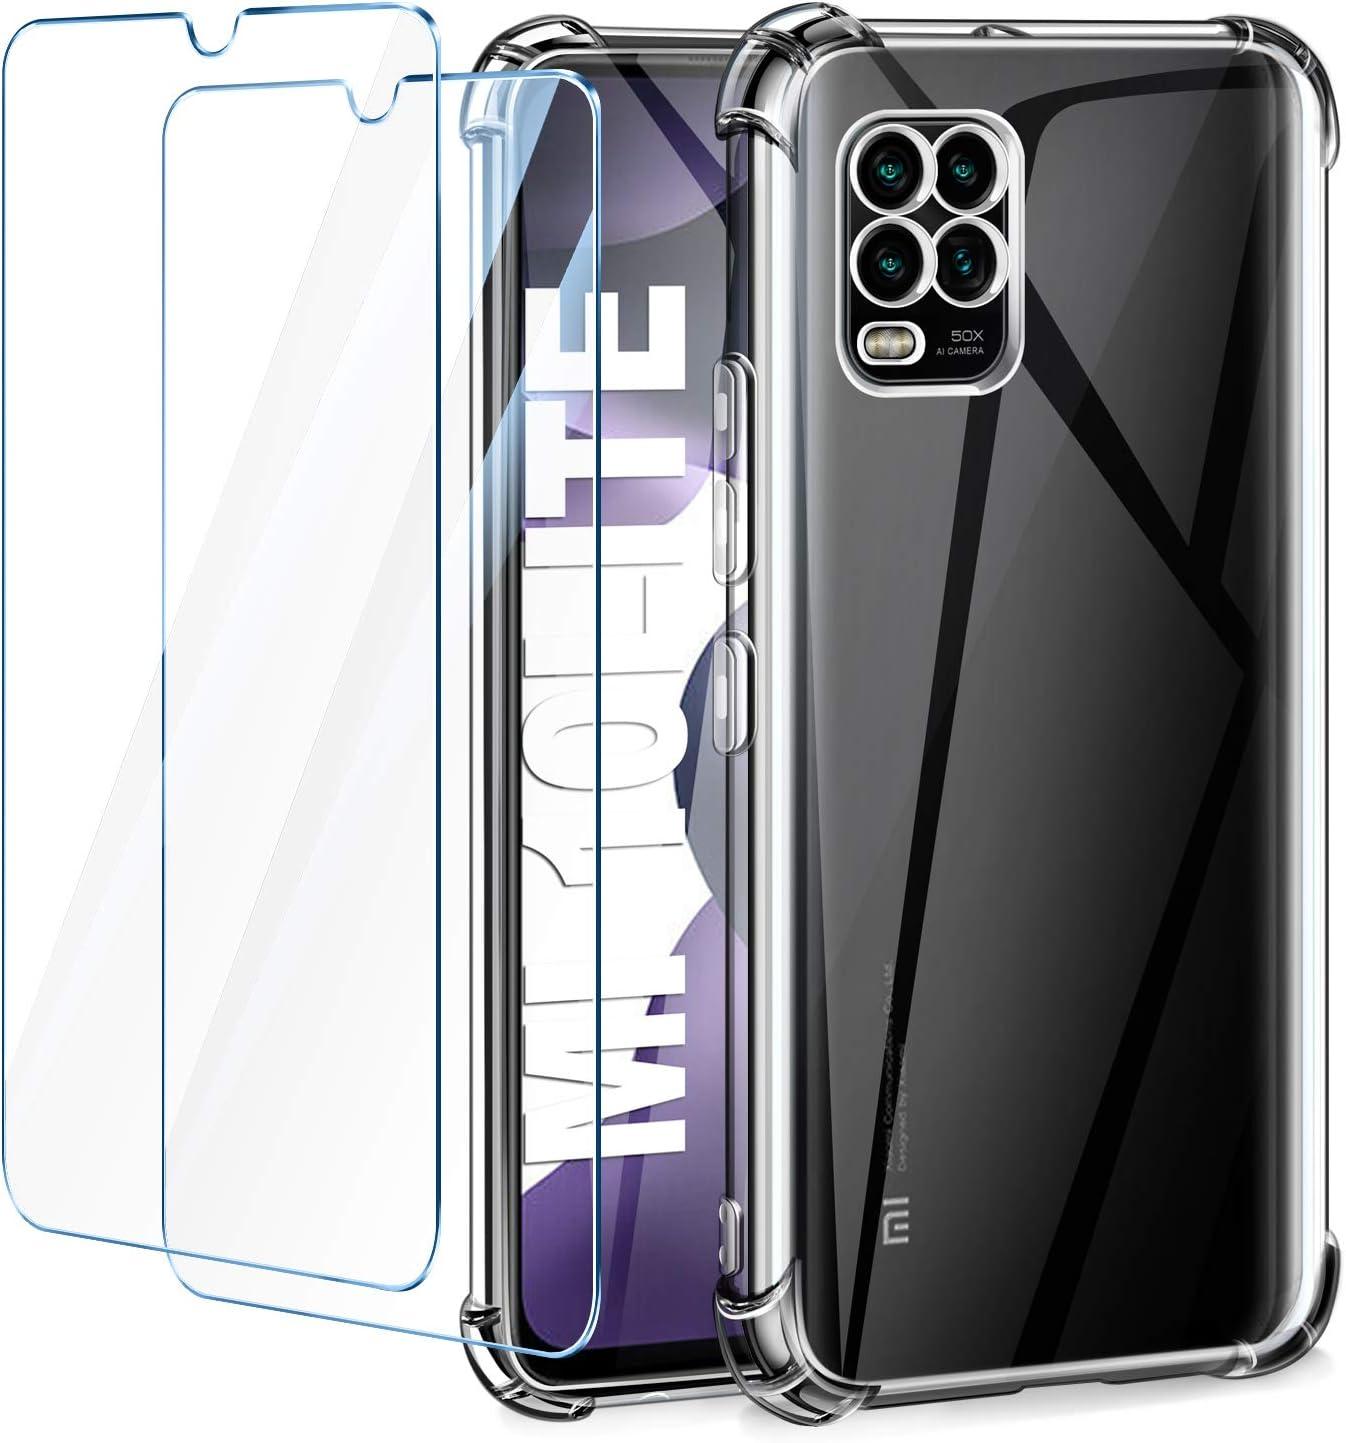 Leathlux Funda Xiaomi Mi 10 Lite 5G + [2 Pack] Cristal Templado Protector de Pantalla, Ultra Fina Silicona Transparente TPU Funda y Protector Airbag Anti-arañazos Carcasa Xiaomi Mi 10 Lite 5G 6.57